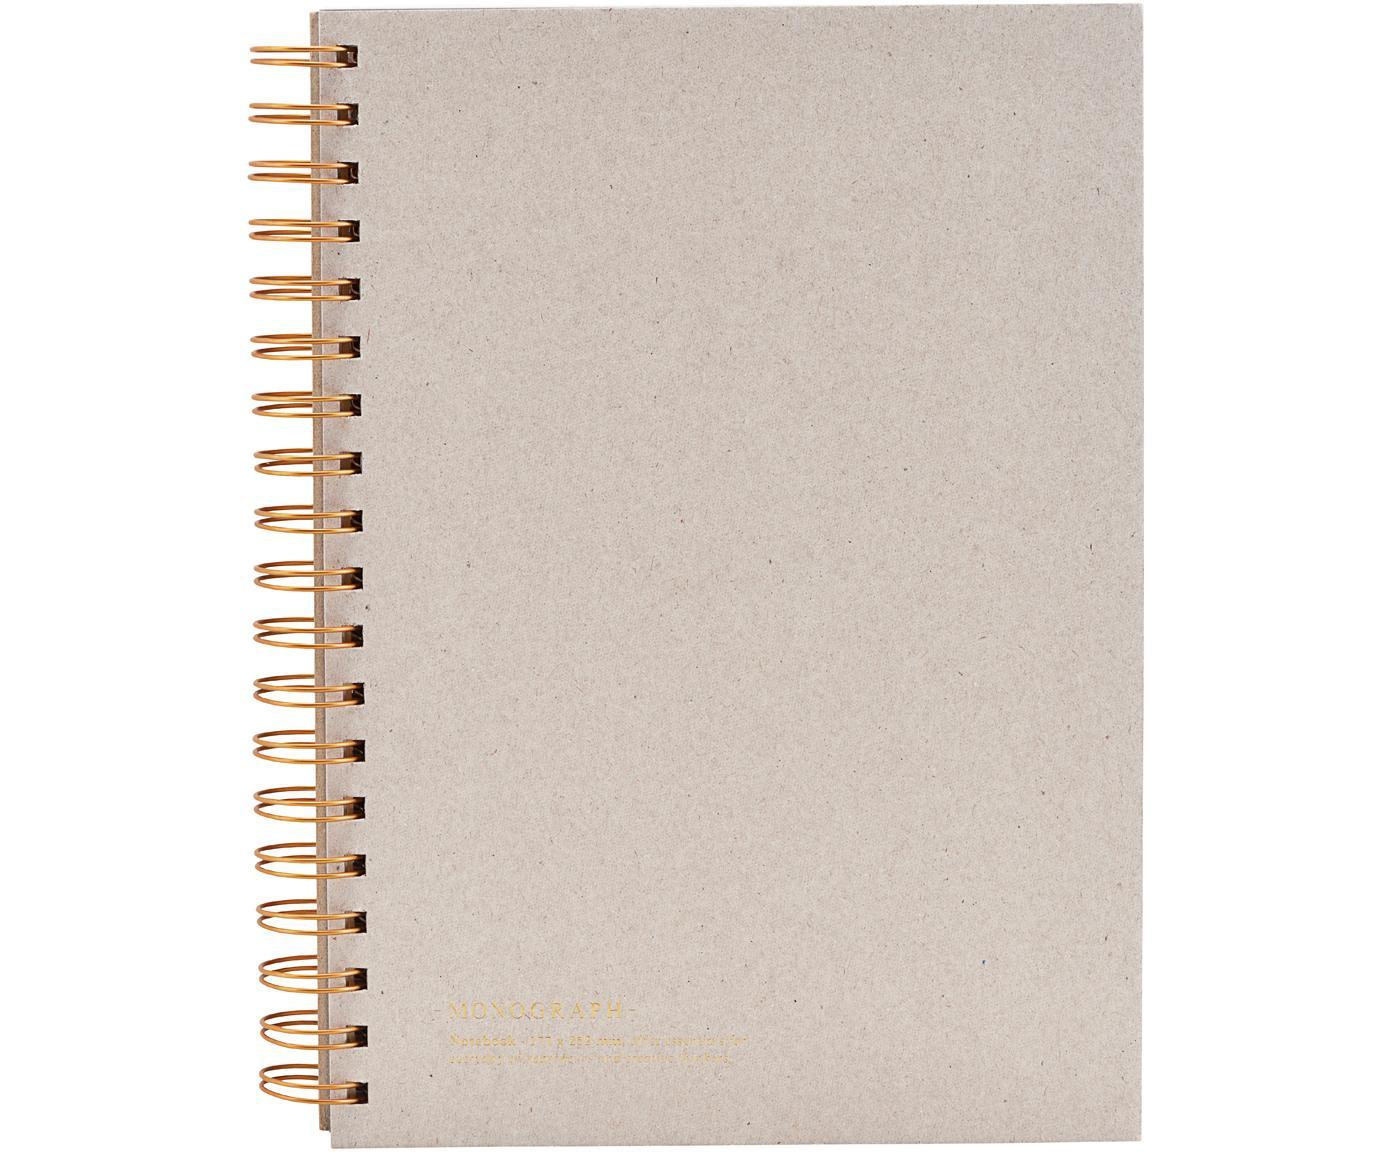 Quaderno a spirale Tab, Beige, rame, Larg. 18 x Alt. 25 cm